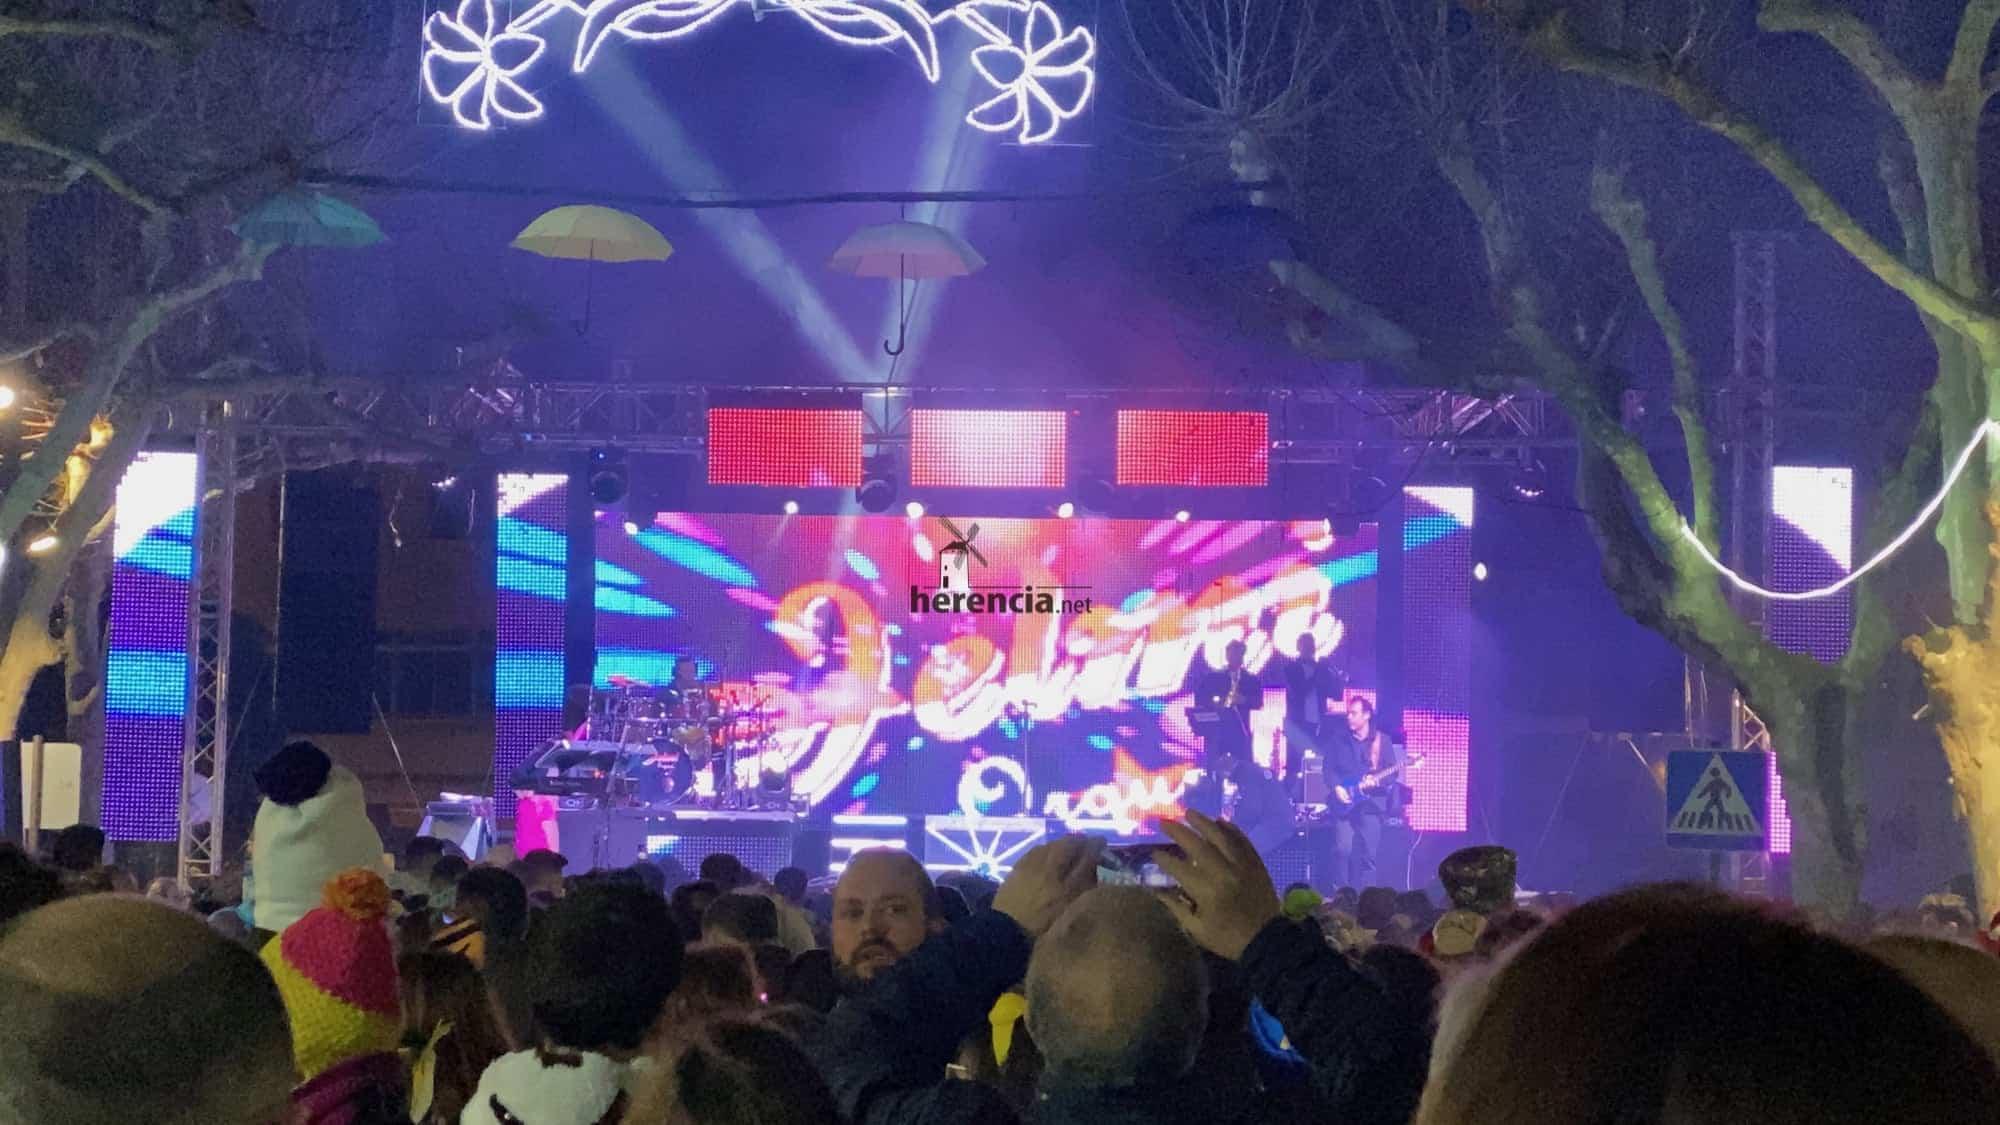 Carnaval de herencia 2019 sabados ansiosos 11 - Inaugurado el Carnaval de Herencia 2020 con el Sábado de los Ansiosos